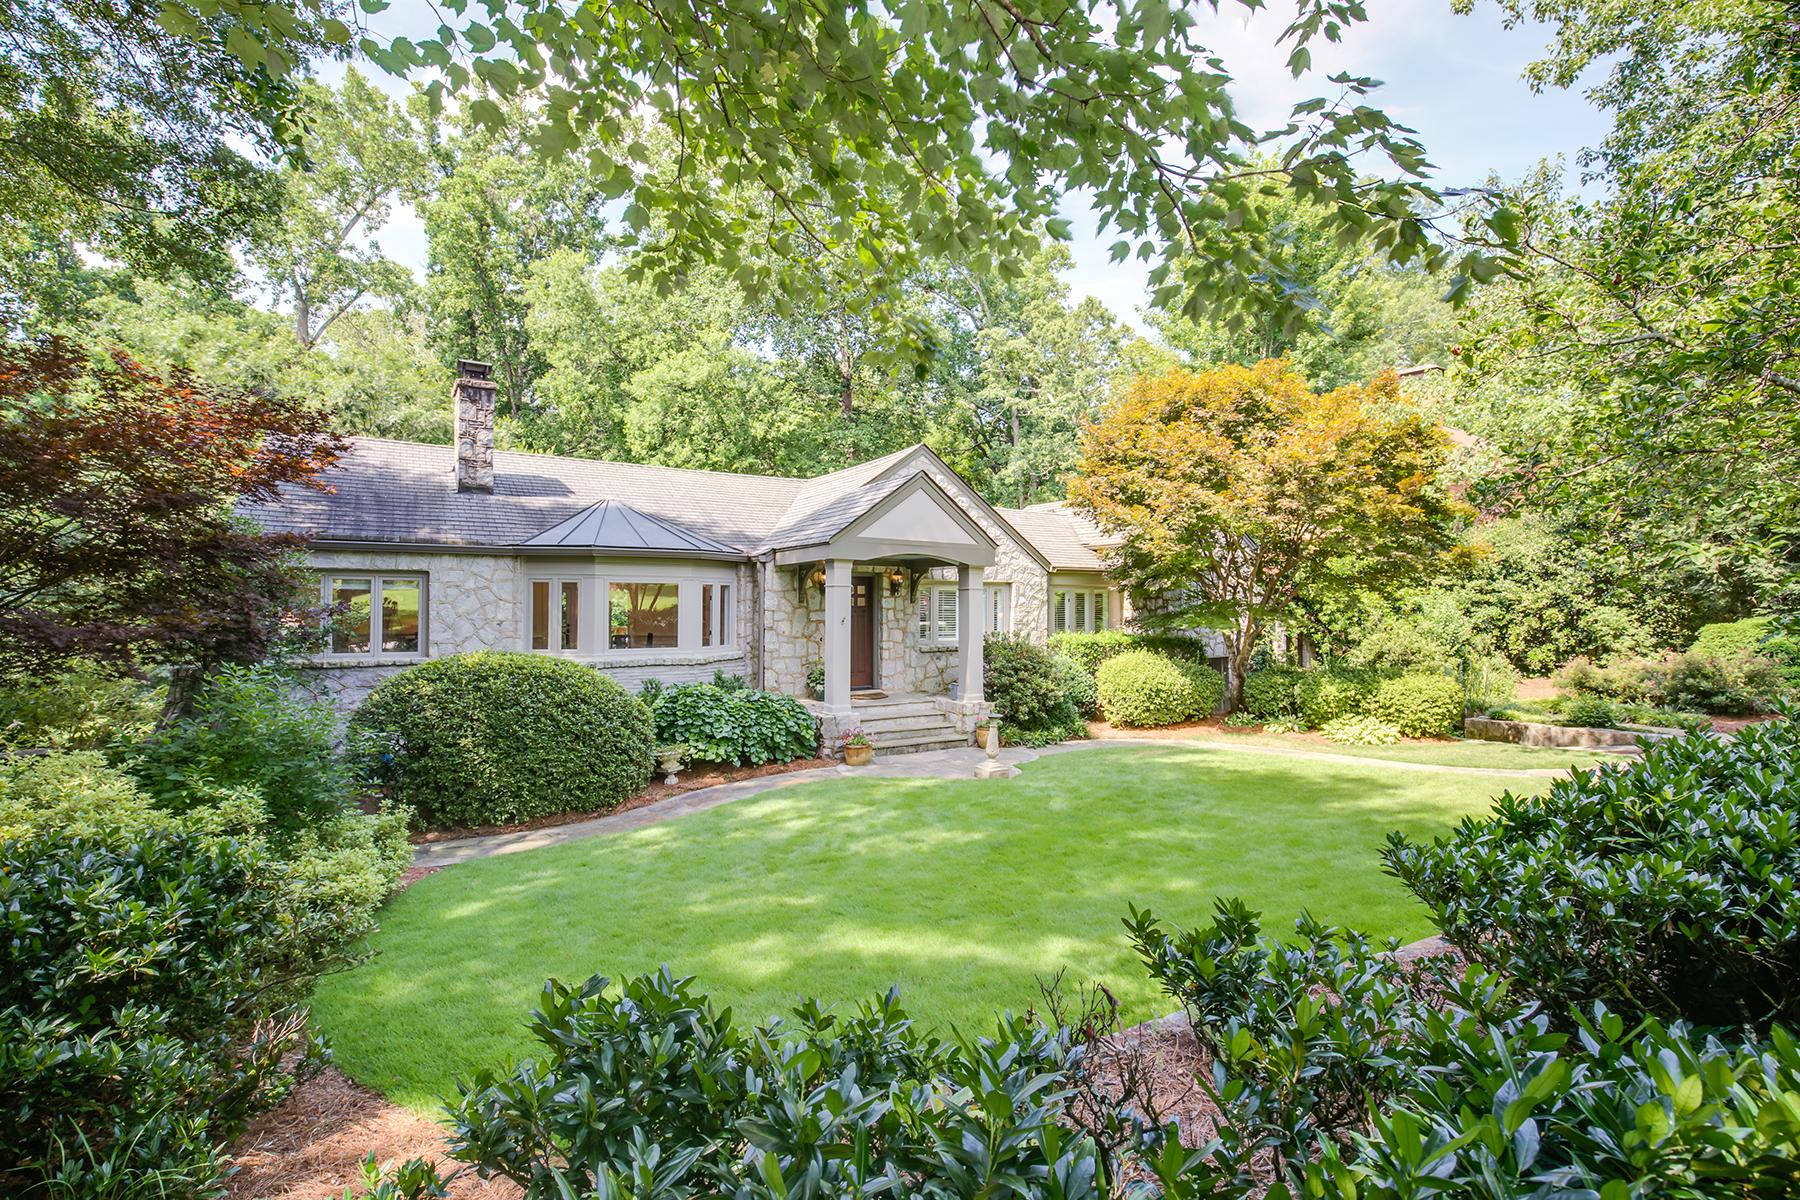 Single Family Home for Sale at Your Private Oasis in Prestigious Druid Hills 1453 Fairview Road NE Atlanta, Georgia 30306 United States